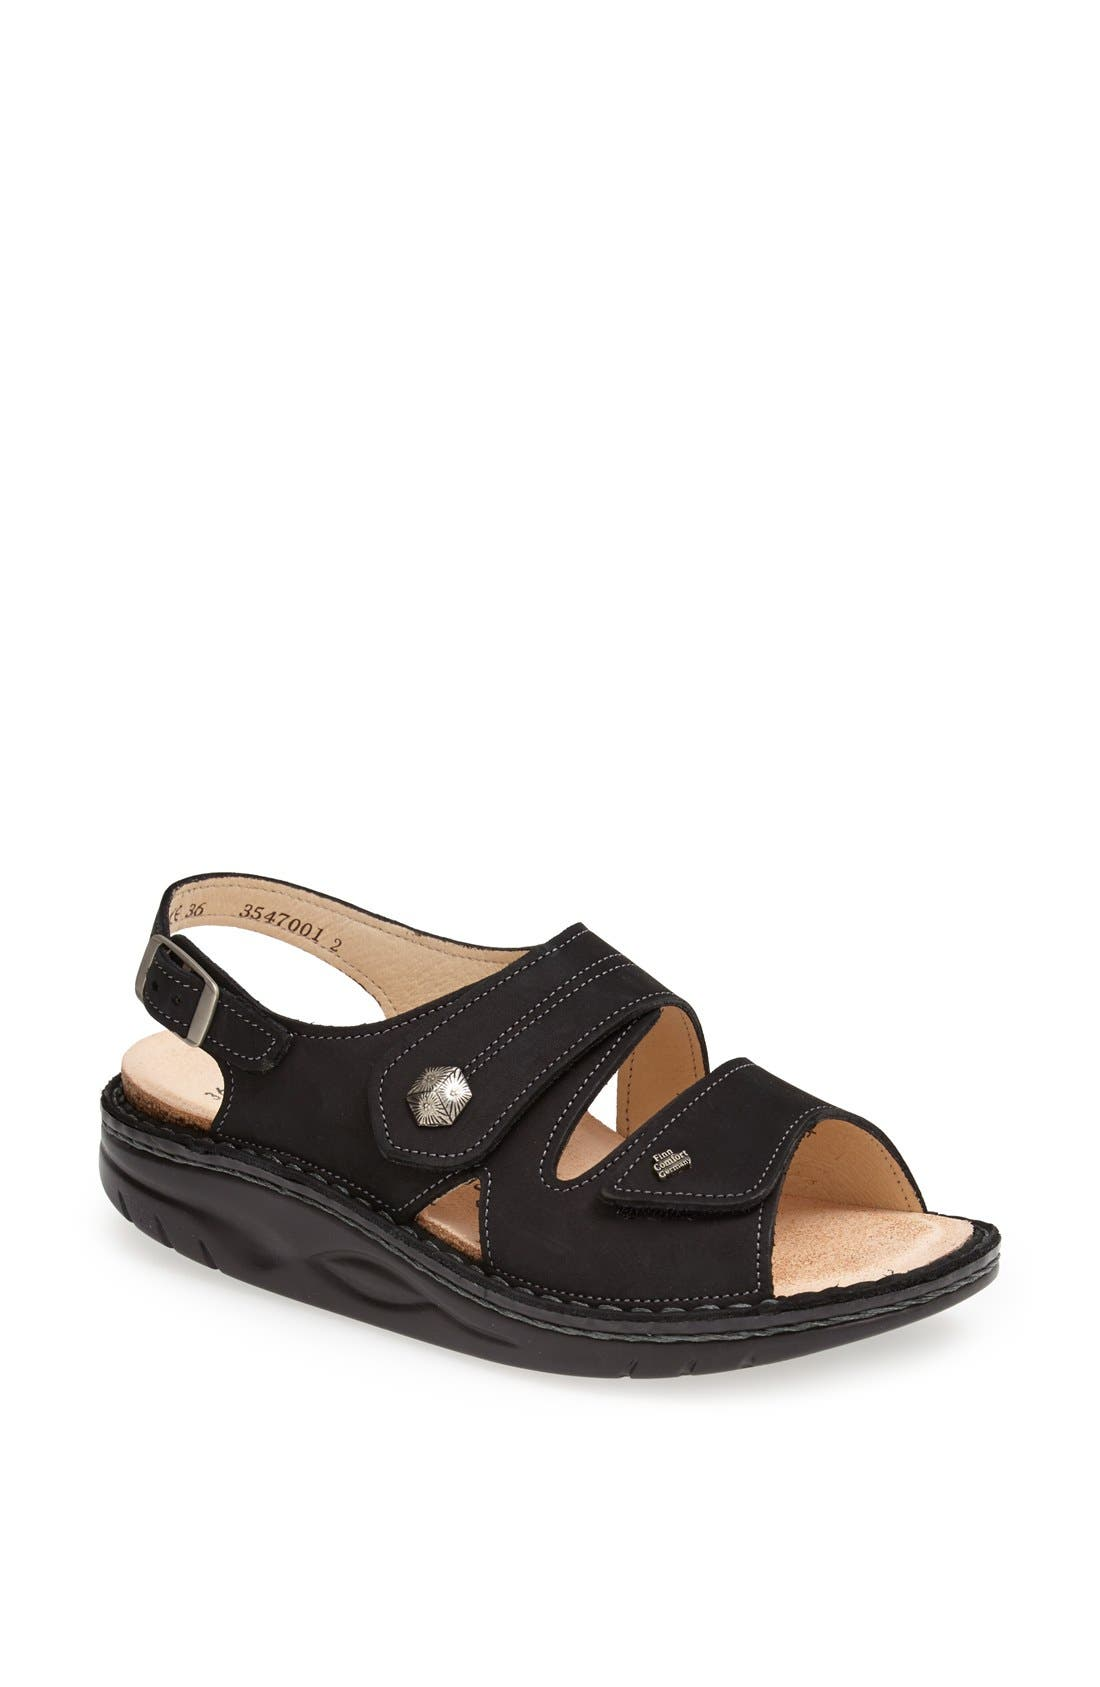 'Sparks' Sandal,                         Main,                         color, 001